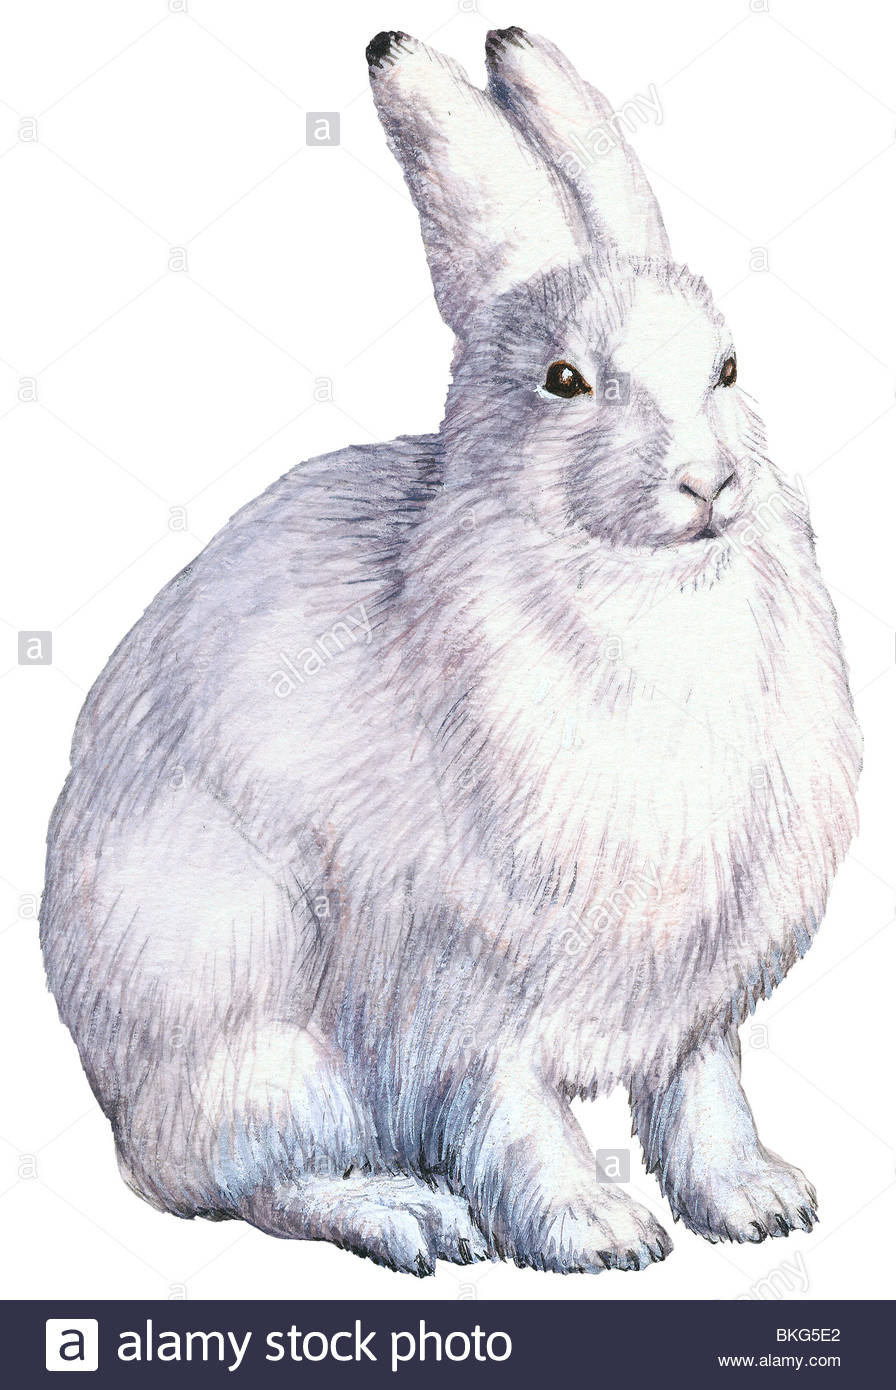 896x1390 Arctic Hare Stock Photo, Royalty Free Image 29244378